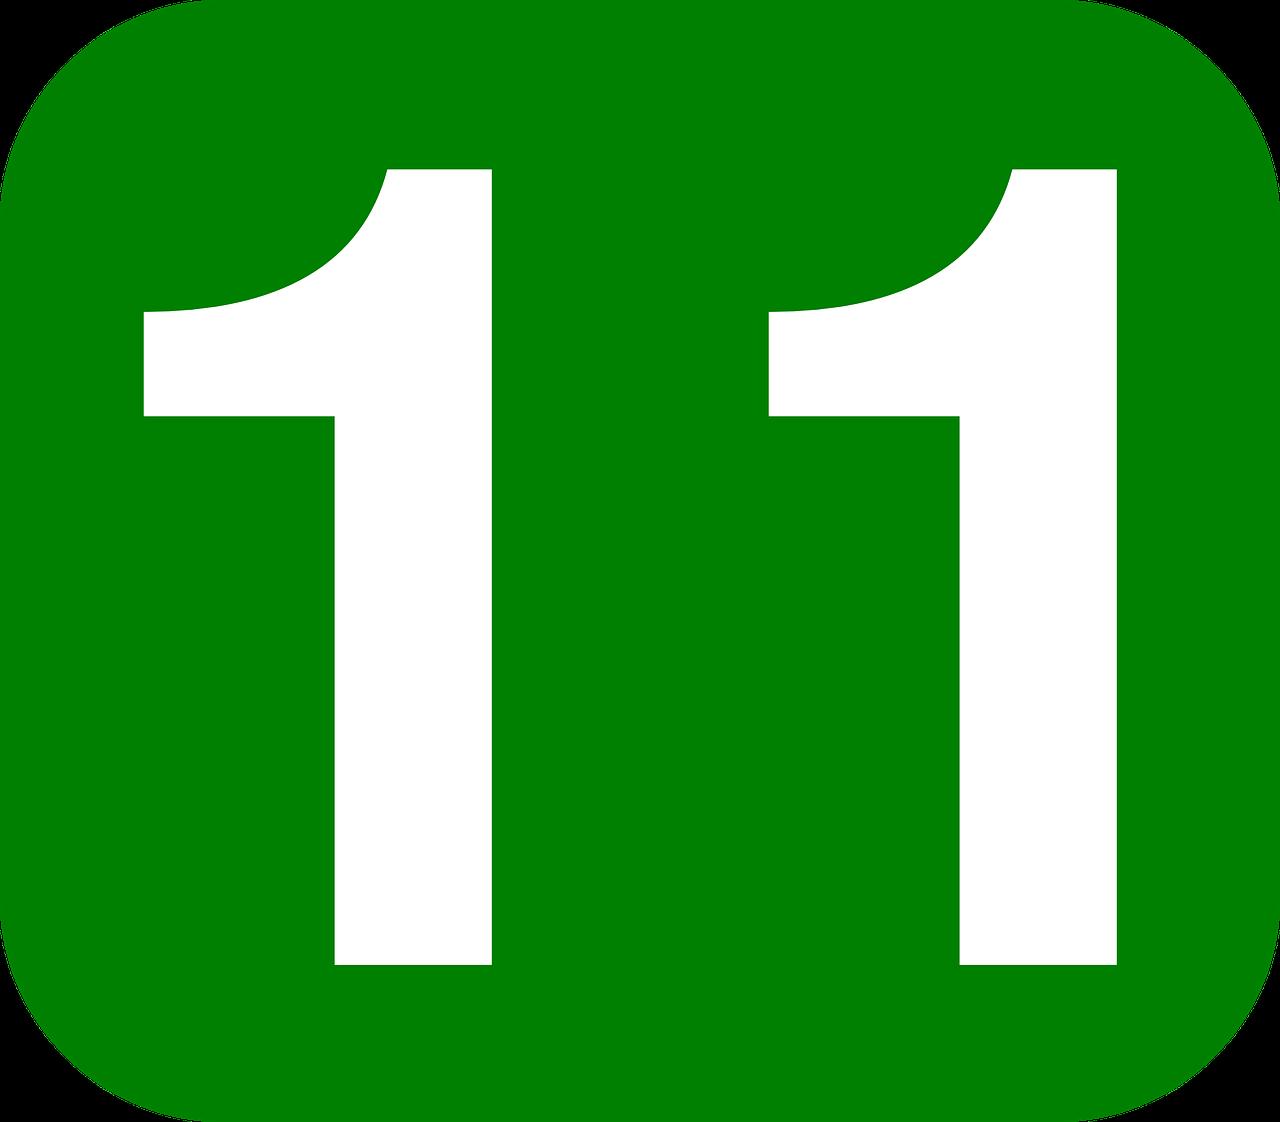 Картинки с цифрой 11